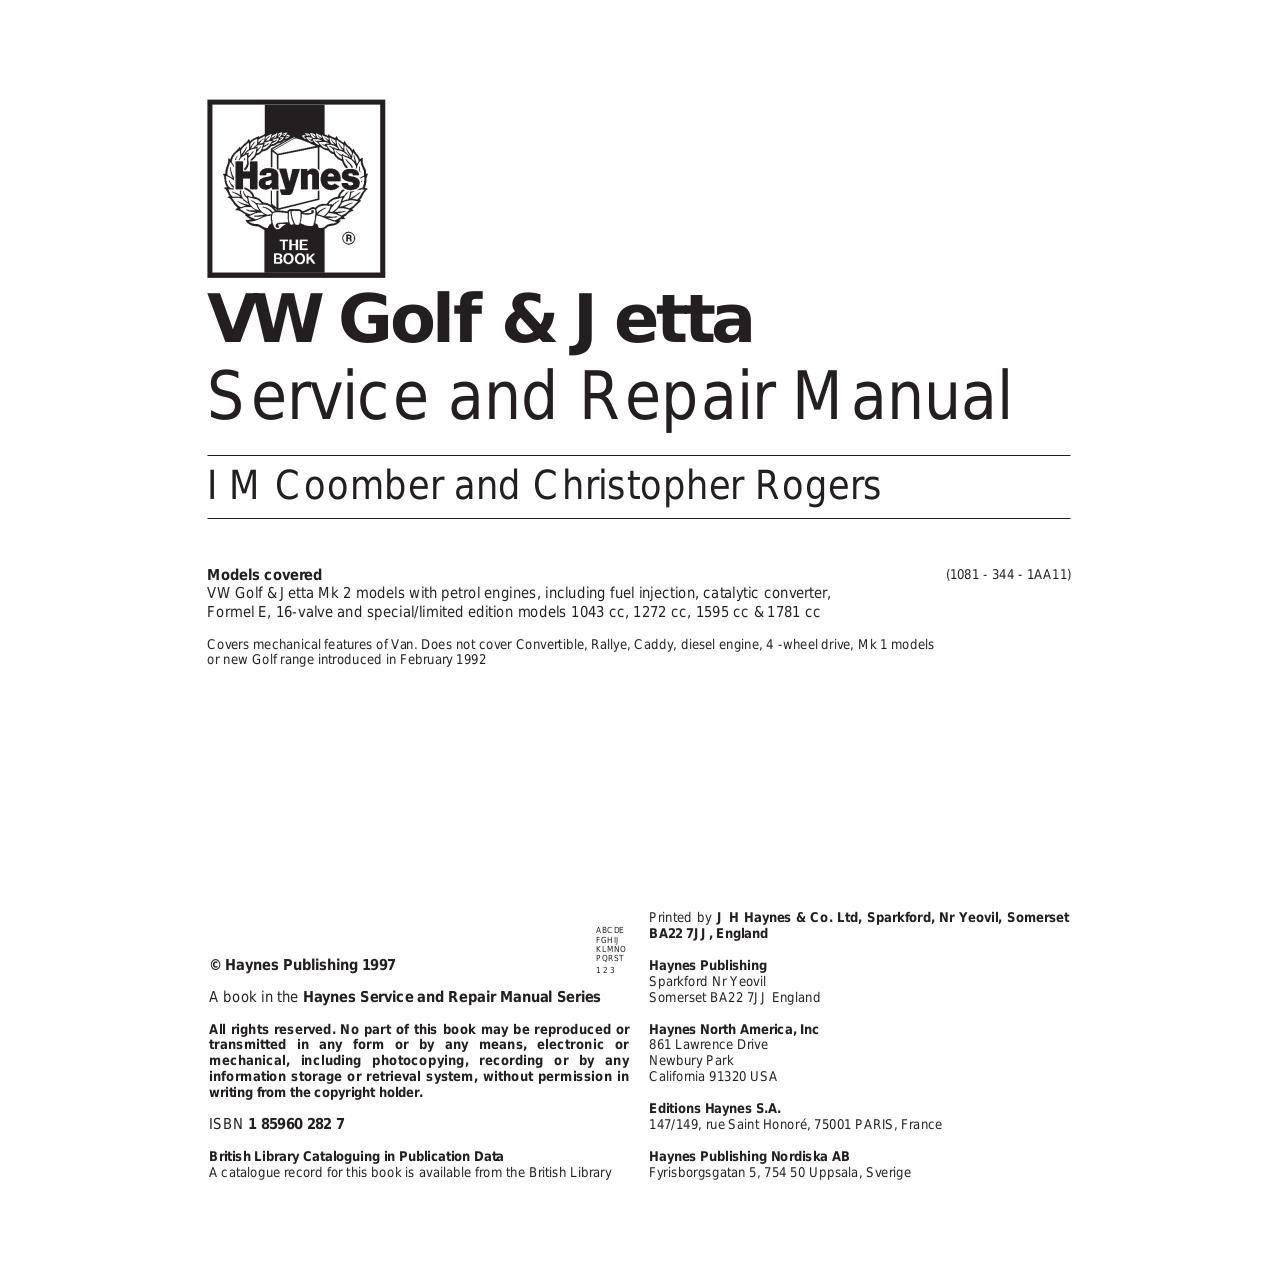 Haynes Golf2 84 92 Essence N 1081 Par Fourbi Revue Technique Vw Jetta 1 8t Timing Belt Volkswagen Golf 2 1984 1992